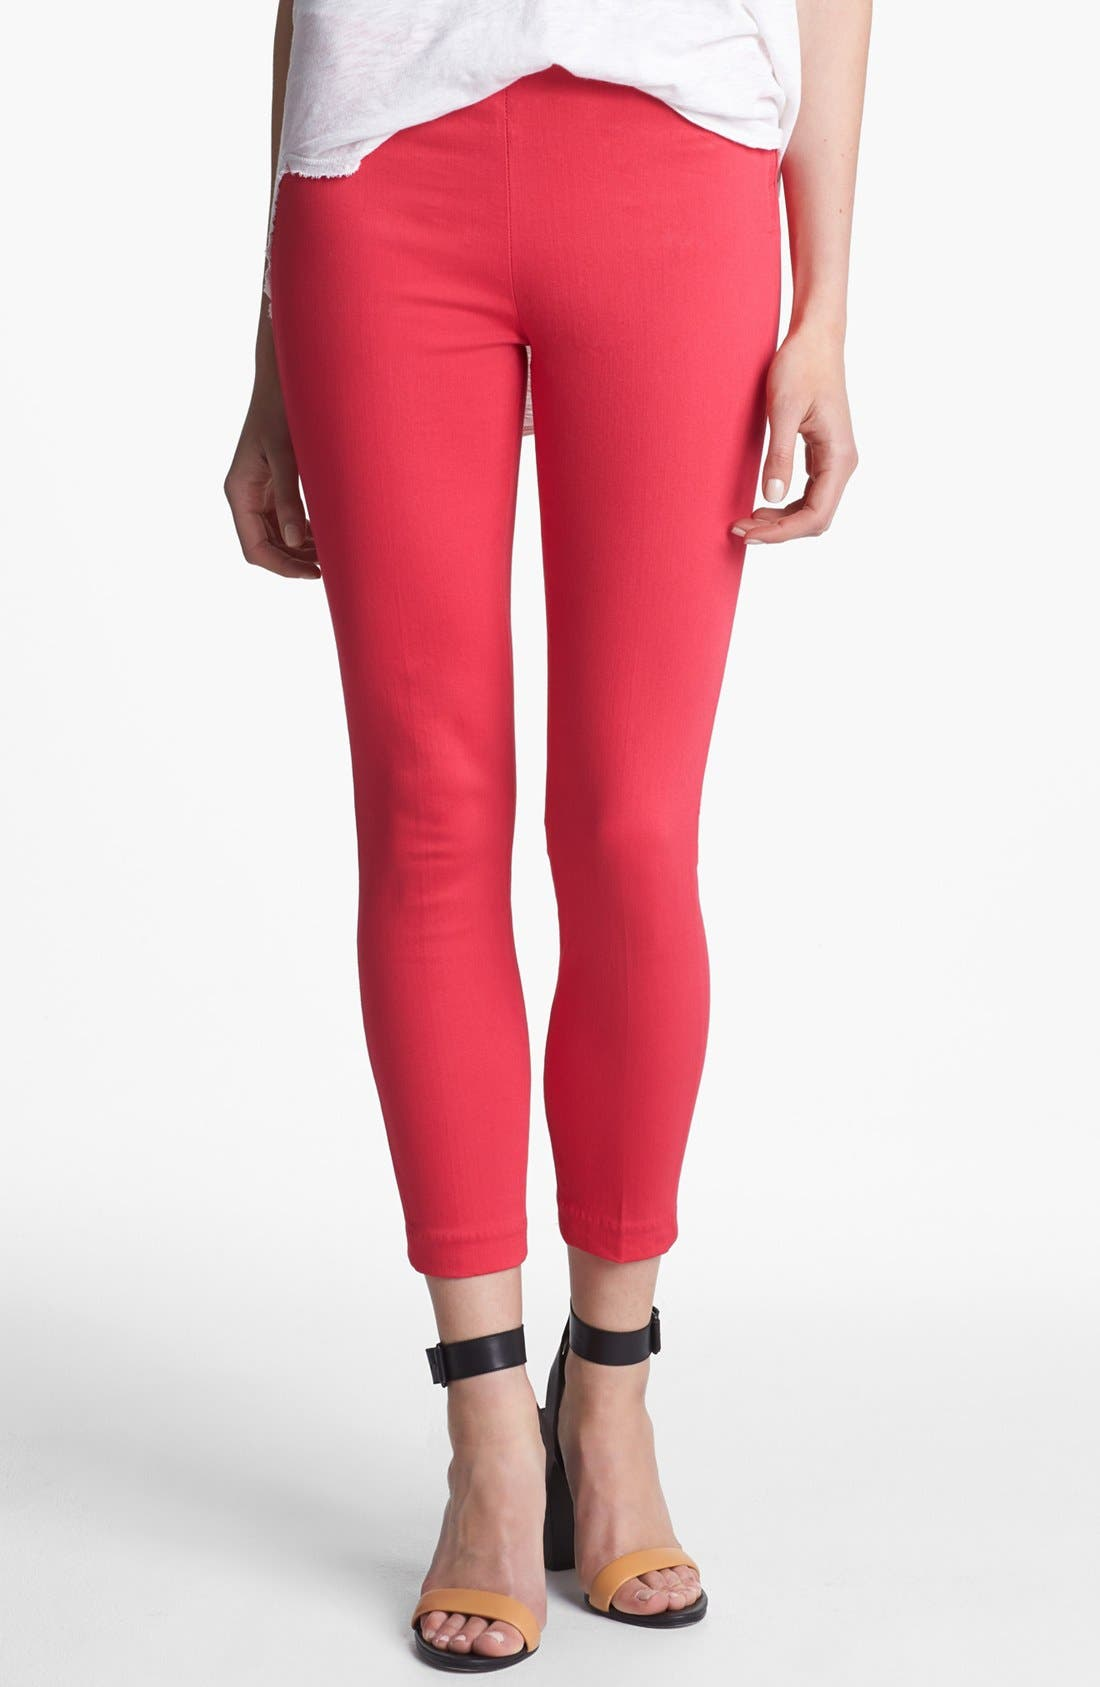 Alternate Image 1 Selected - J Brand 'Clean' Stretch Capri Pants